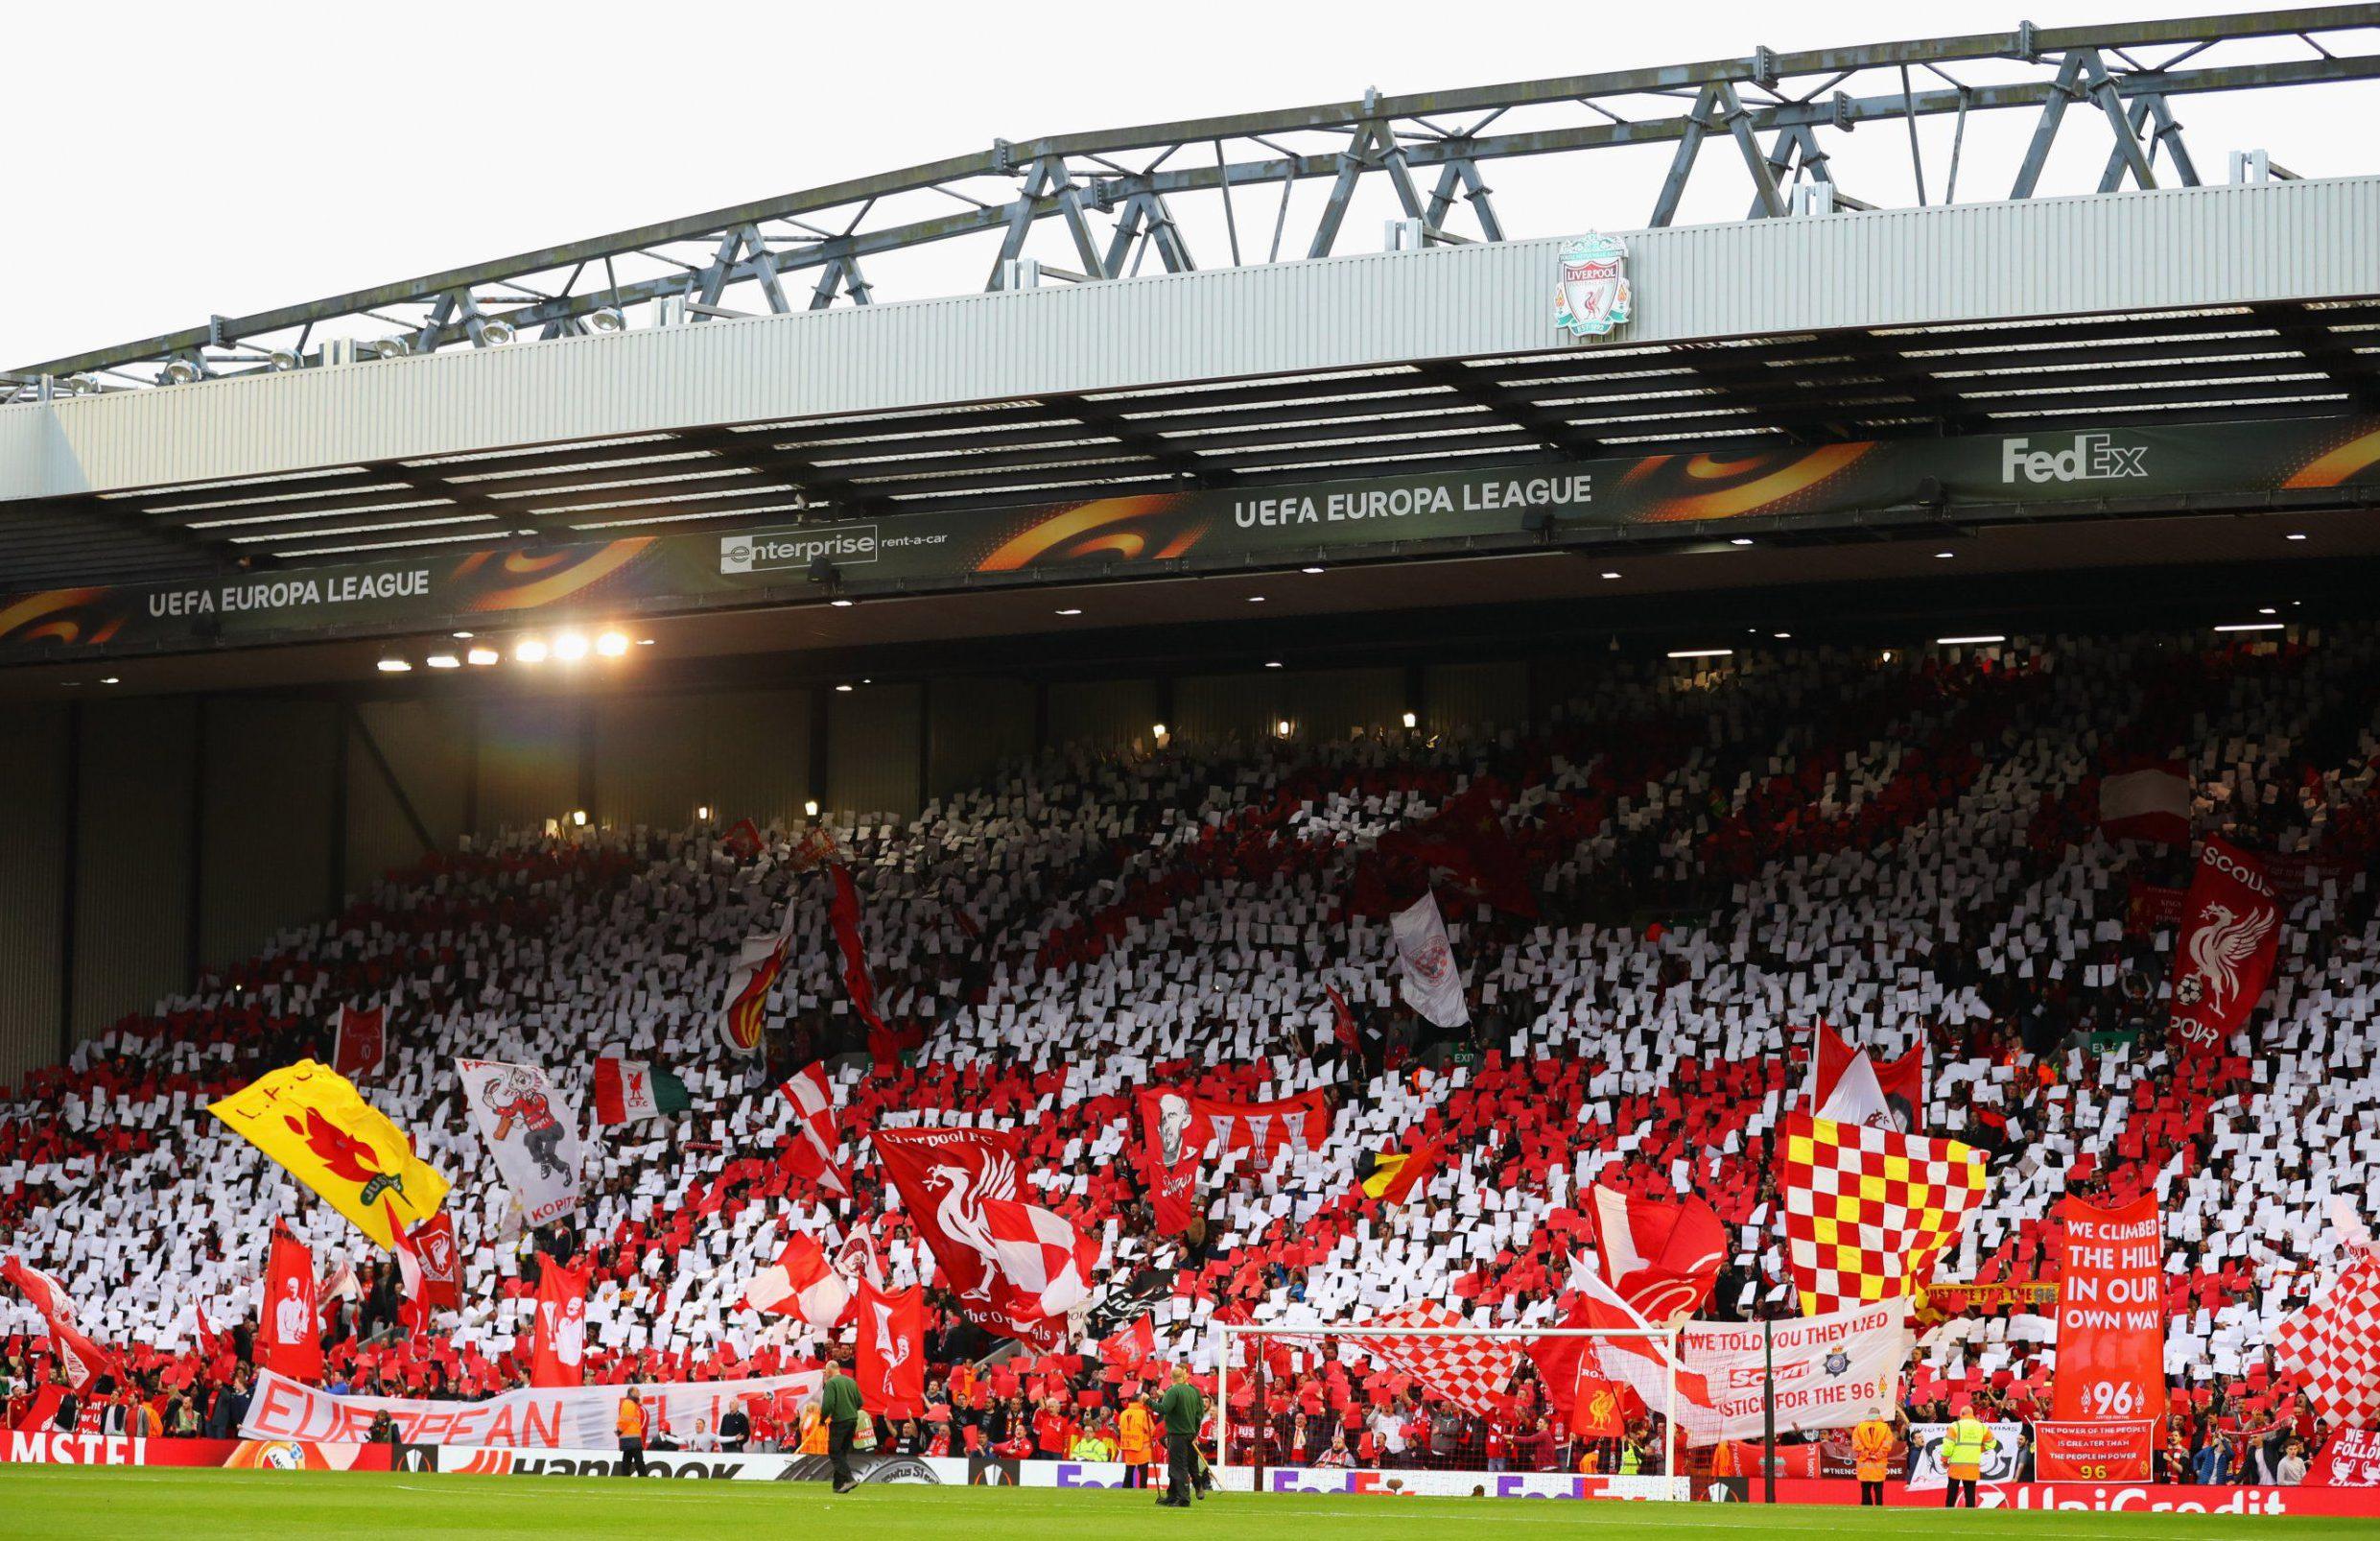 Liverpool pay emotional tribute to Hillsborough victims ahead of Villarreal Europa League semi-final